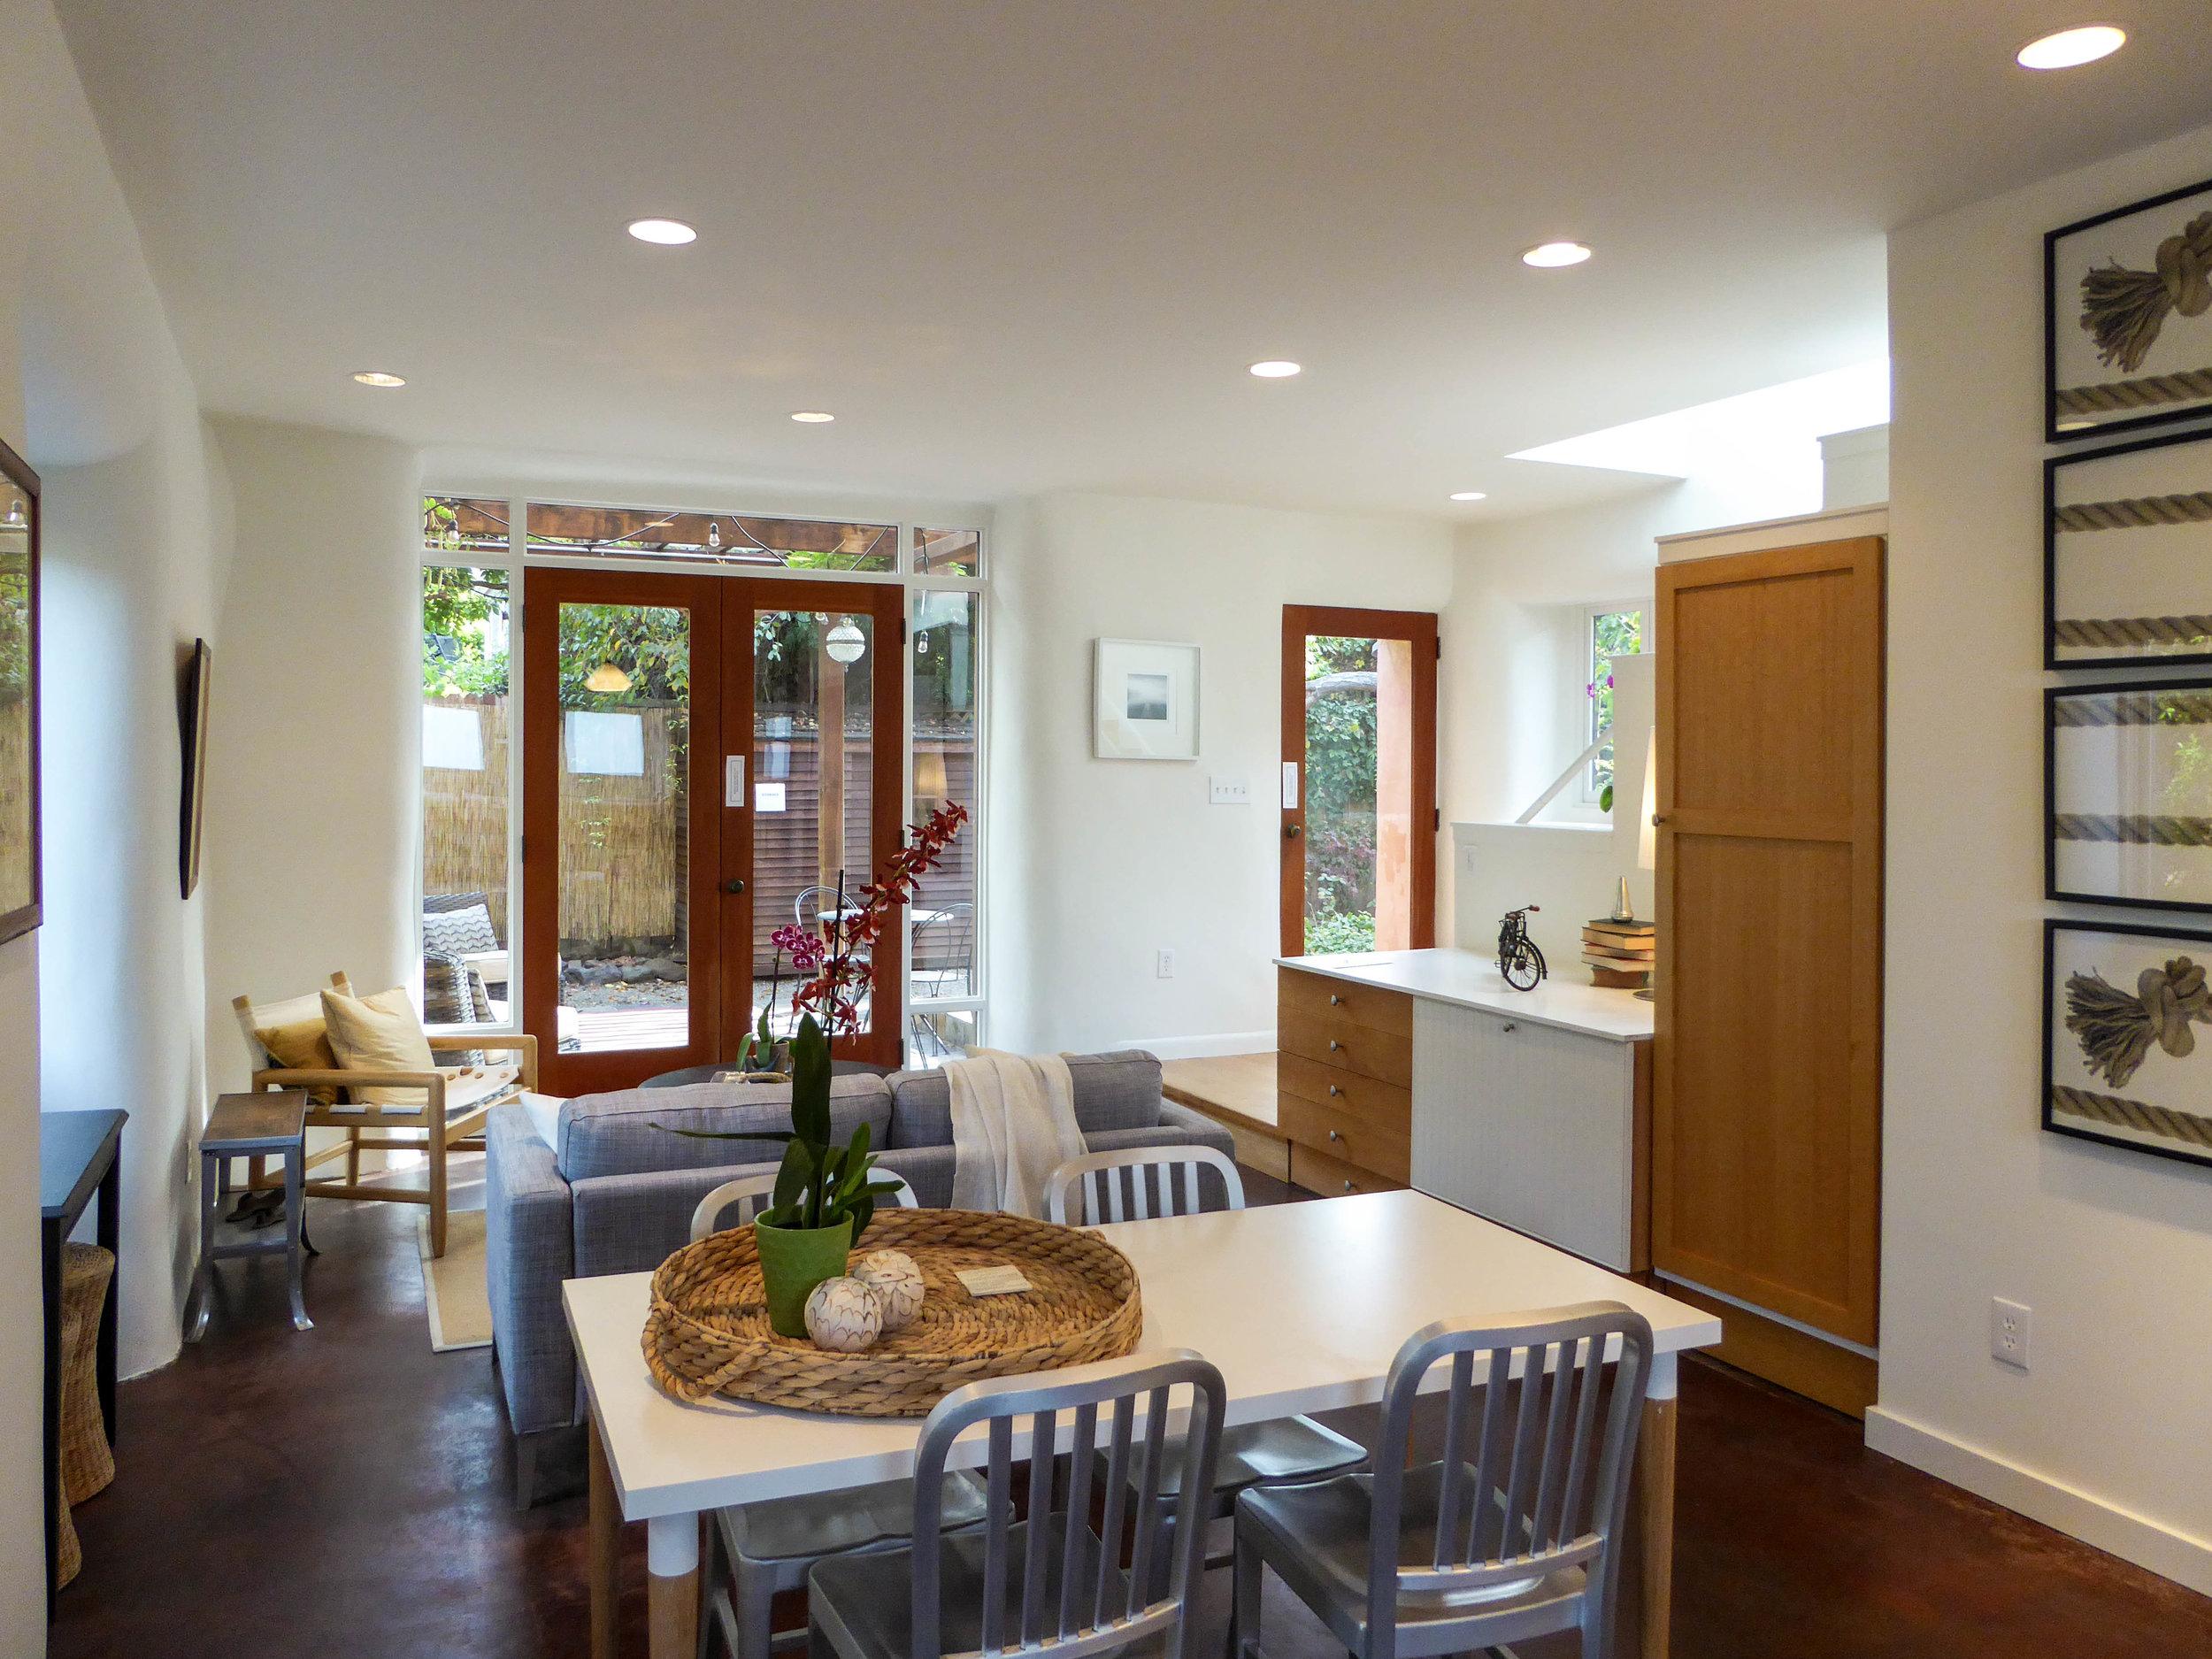 Berkeley Cottage-06-1030173.JPG